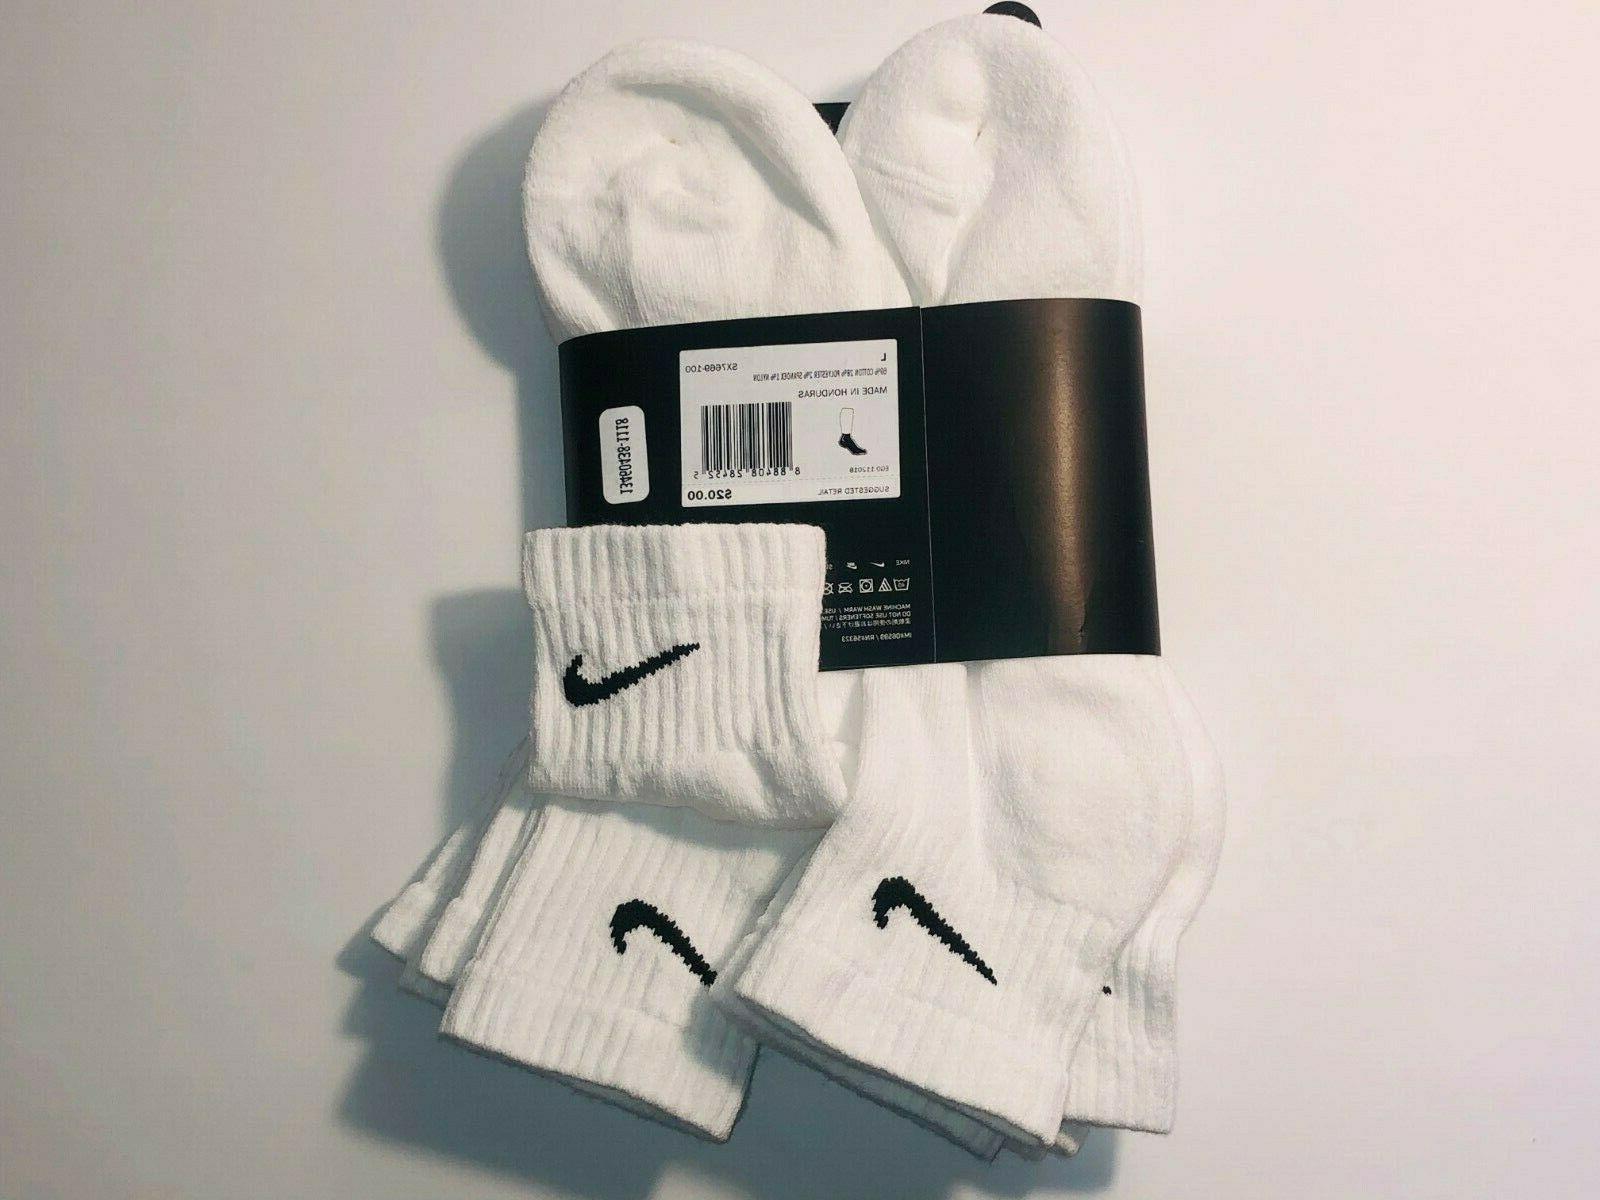 Nike Men's Cushion White 8-12